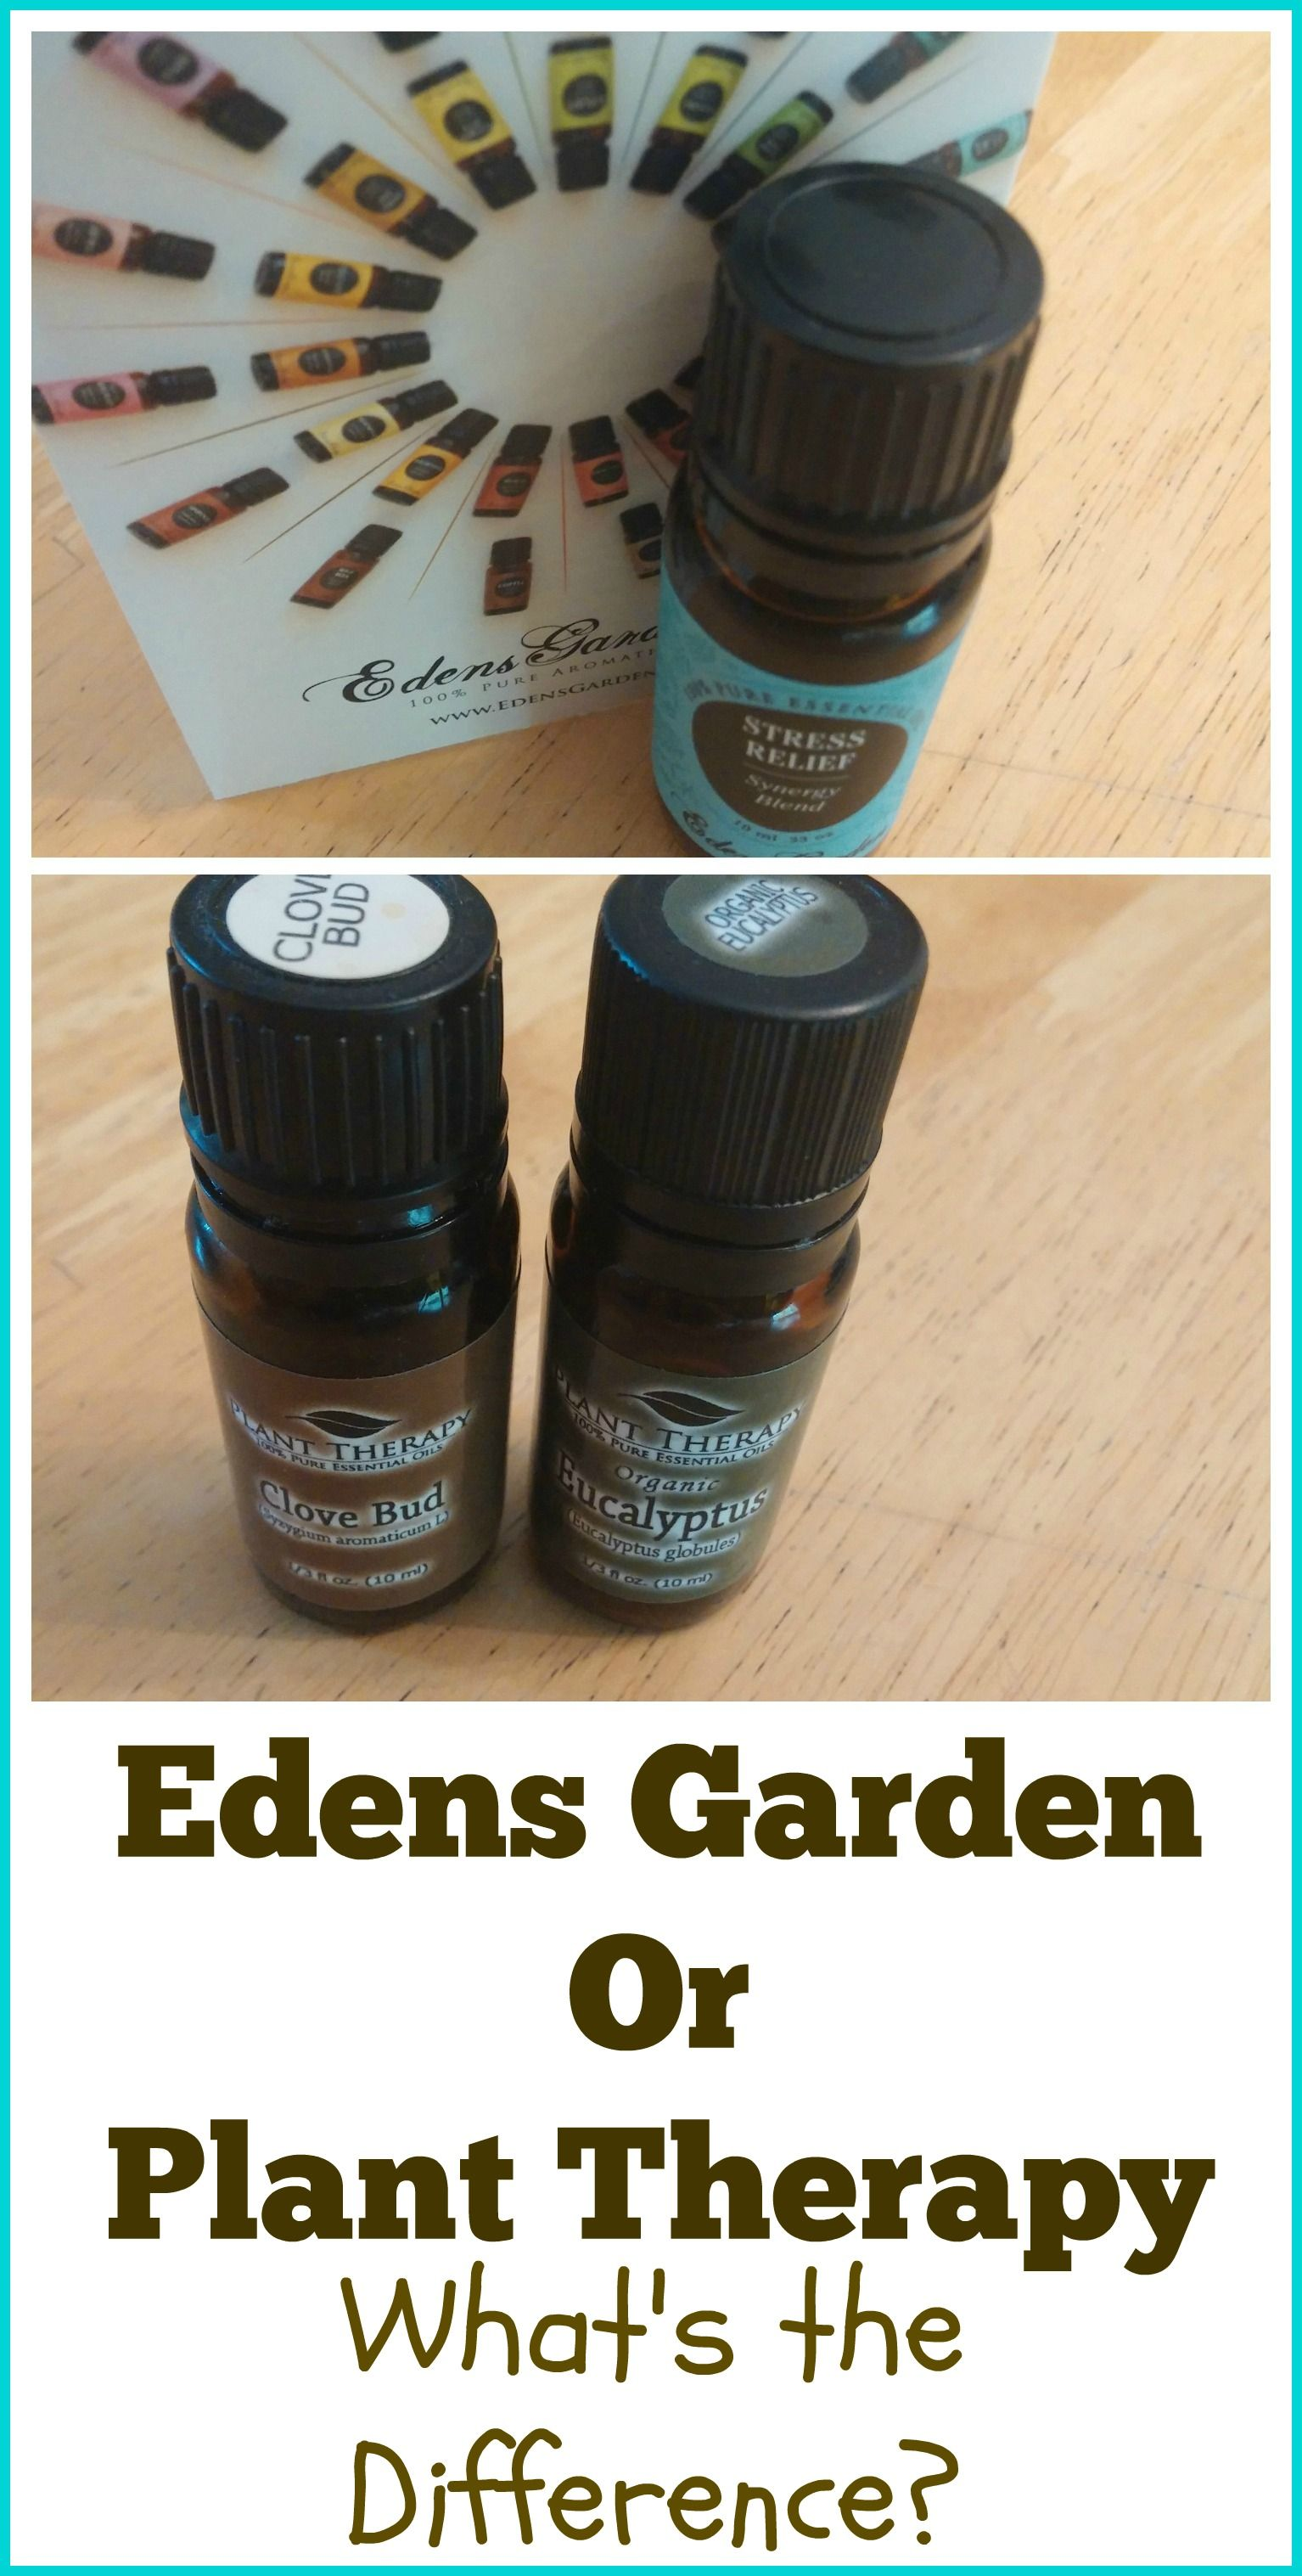 Edens garden vs plant therapy organic palace queen - Edens garden essential oils reviews ...